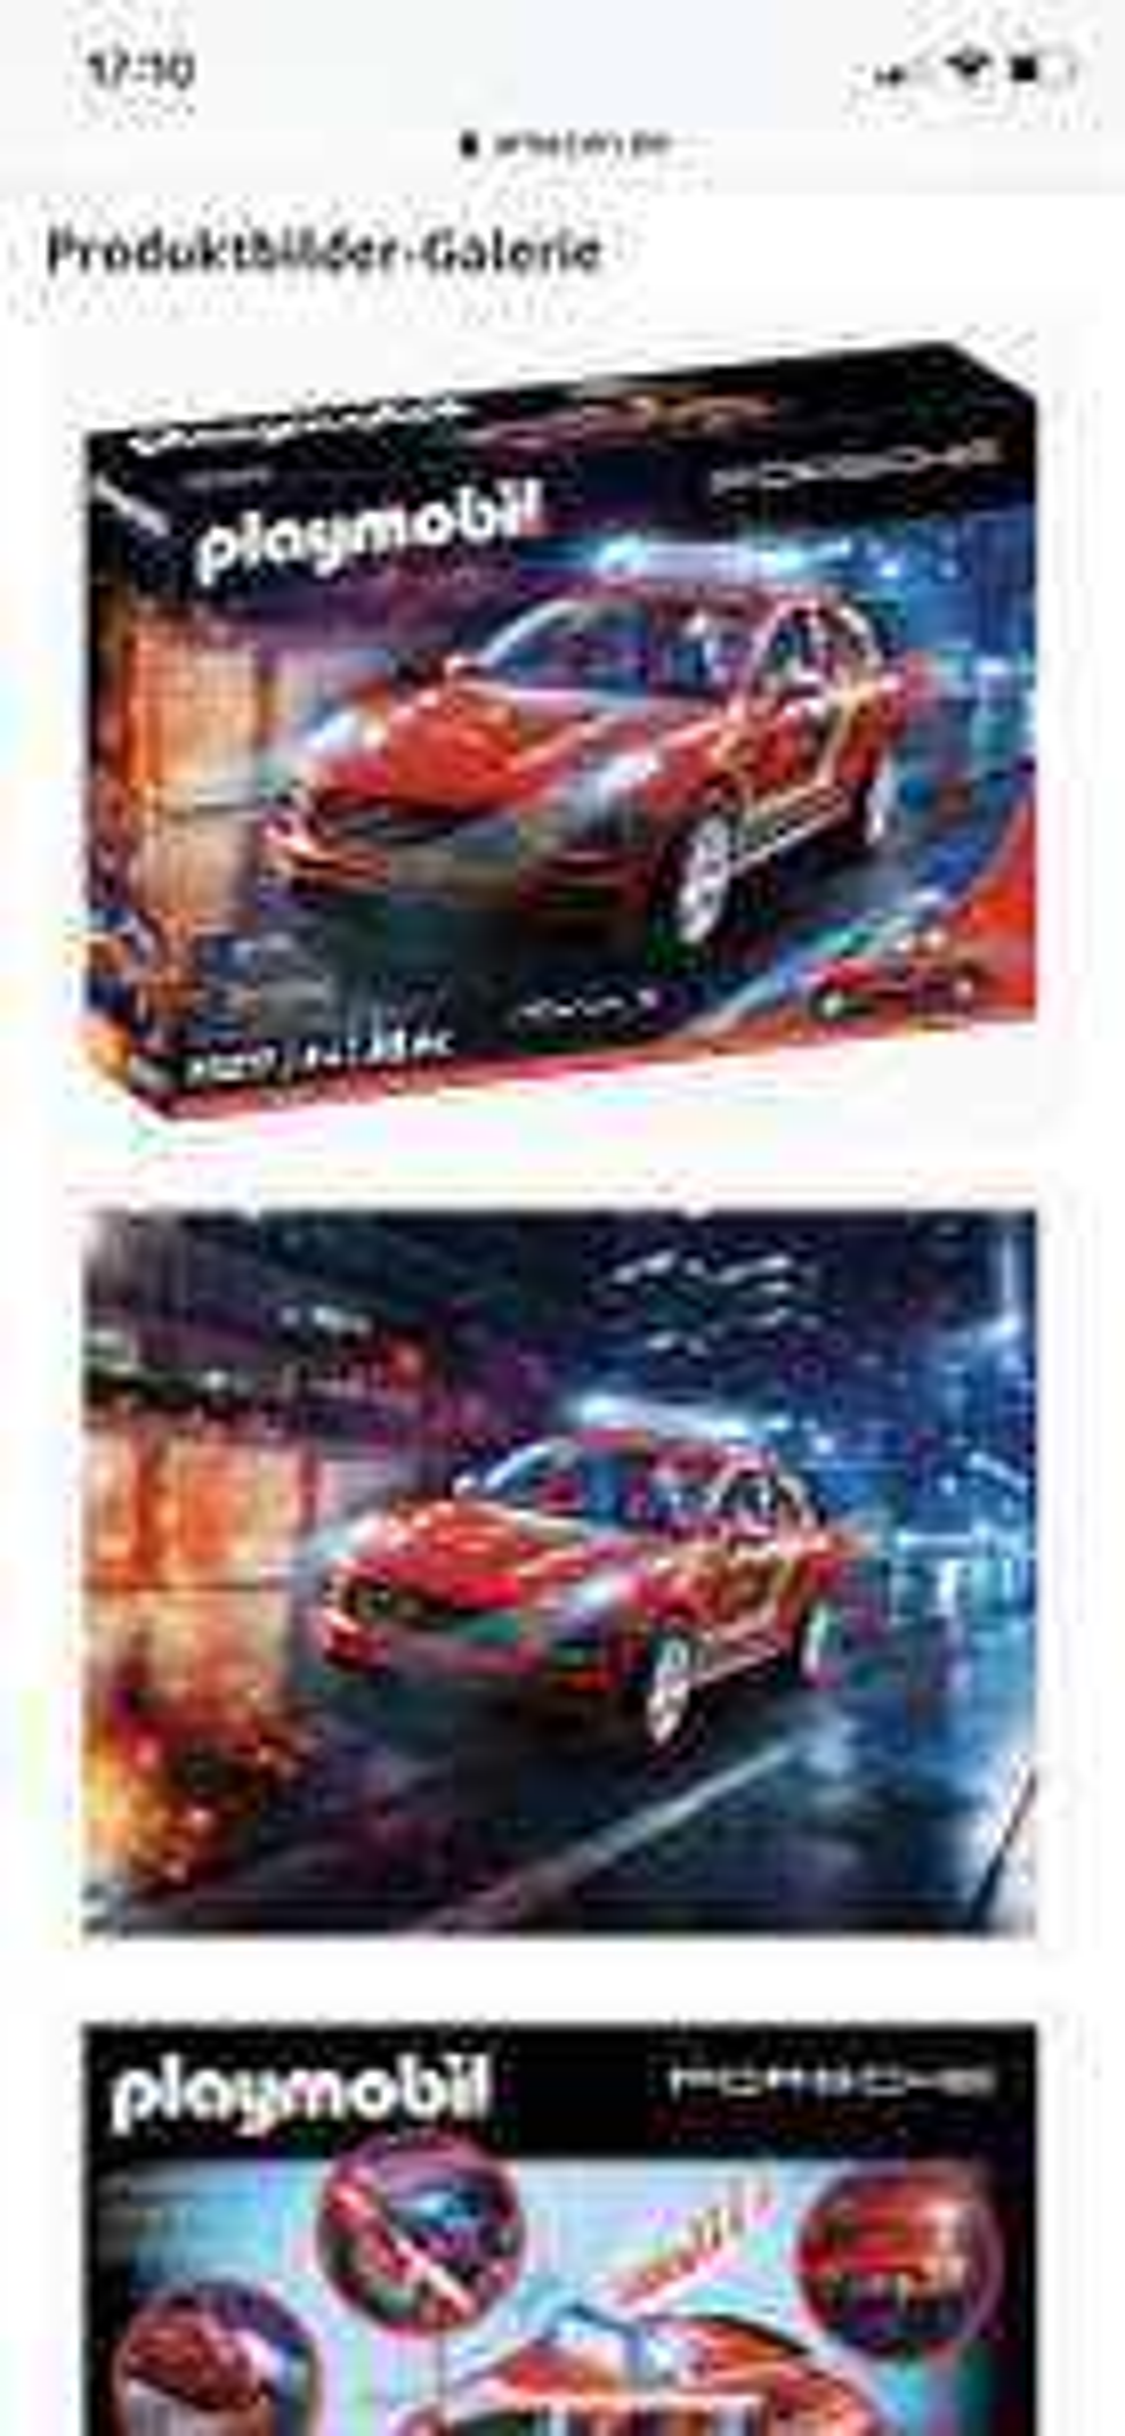 Amazon Prime - Playmobil Porsche 70277 Porsche Macan S Feuerwehr